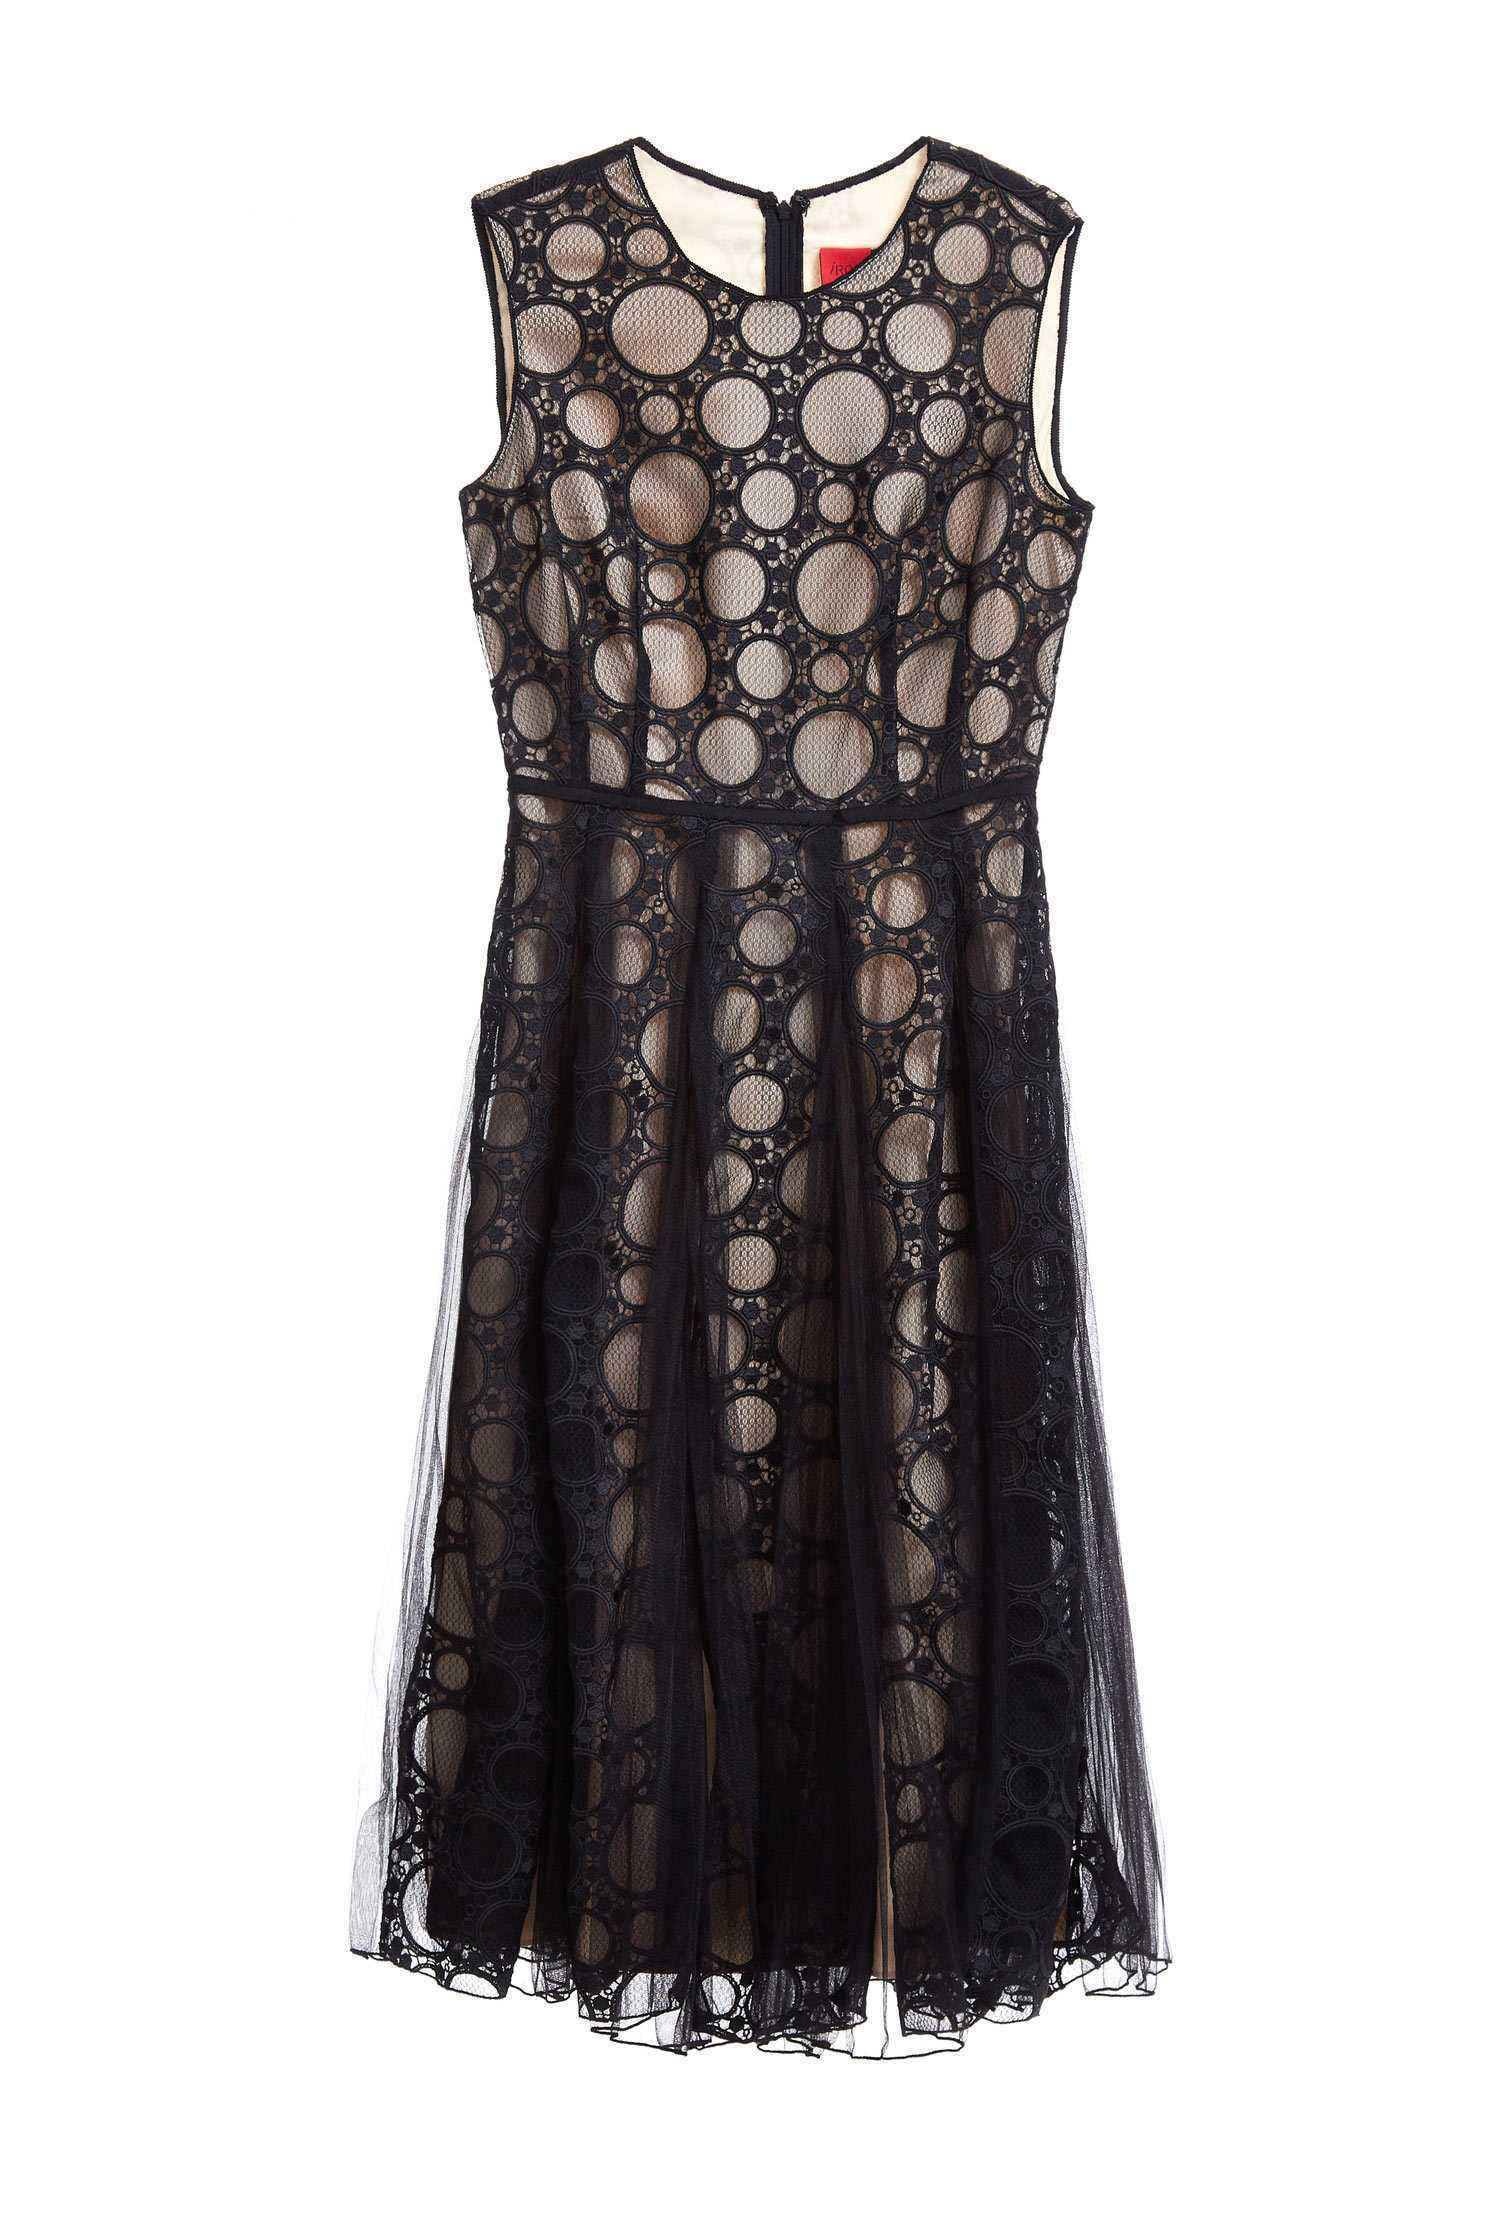 Elegance and gorgeous designed dress